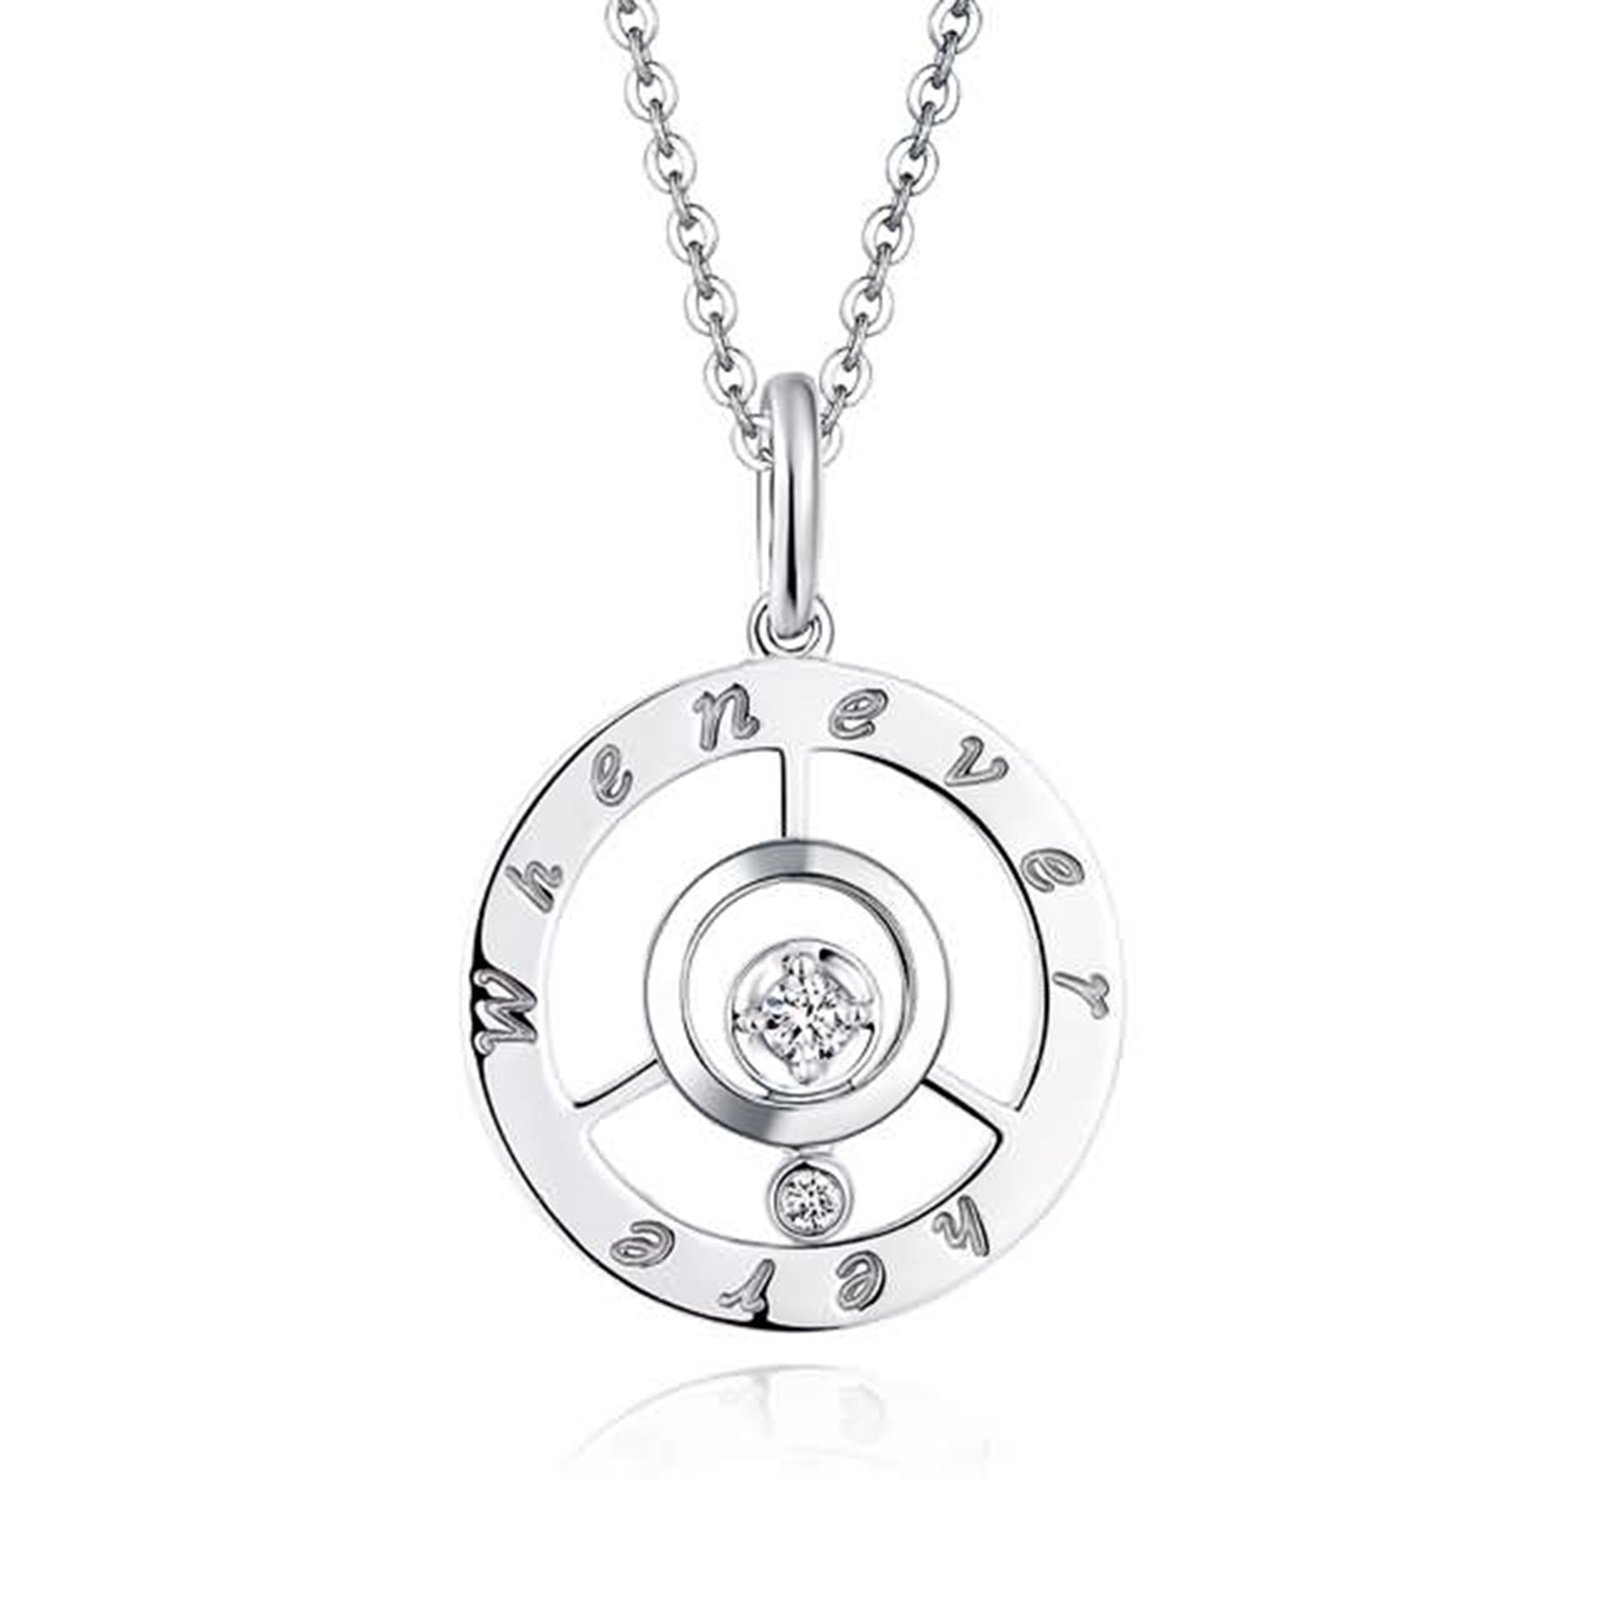 Adisaer 18k(750) White Gold Women Necklace 1.57g ''Whenever Here'' Round Diamond Wedding Necklace